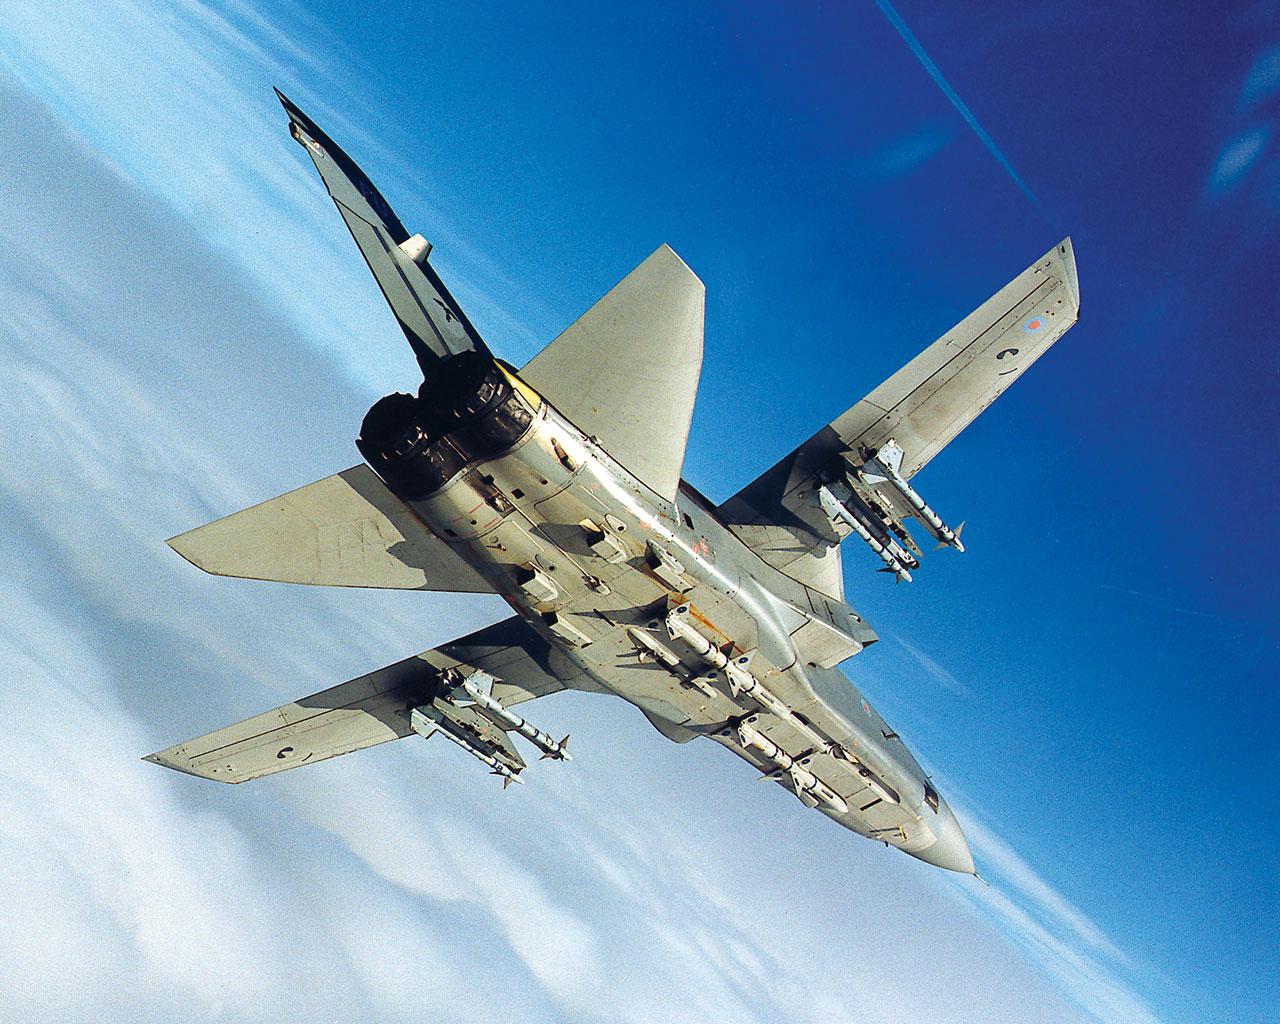 http://4.bp.blogspot.com/_m1Z6uxpmlU8/TLte_toTn5I/AAAAAAAAB7A/j8NkK2d9GtA/s1600/Tornado_F3,_RAF_Aircraft.jpg